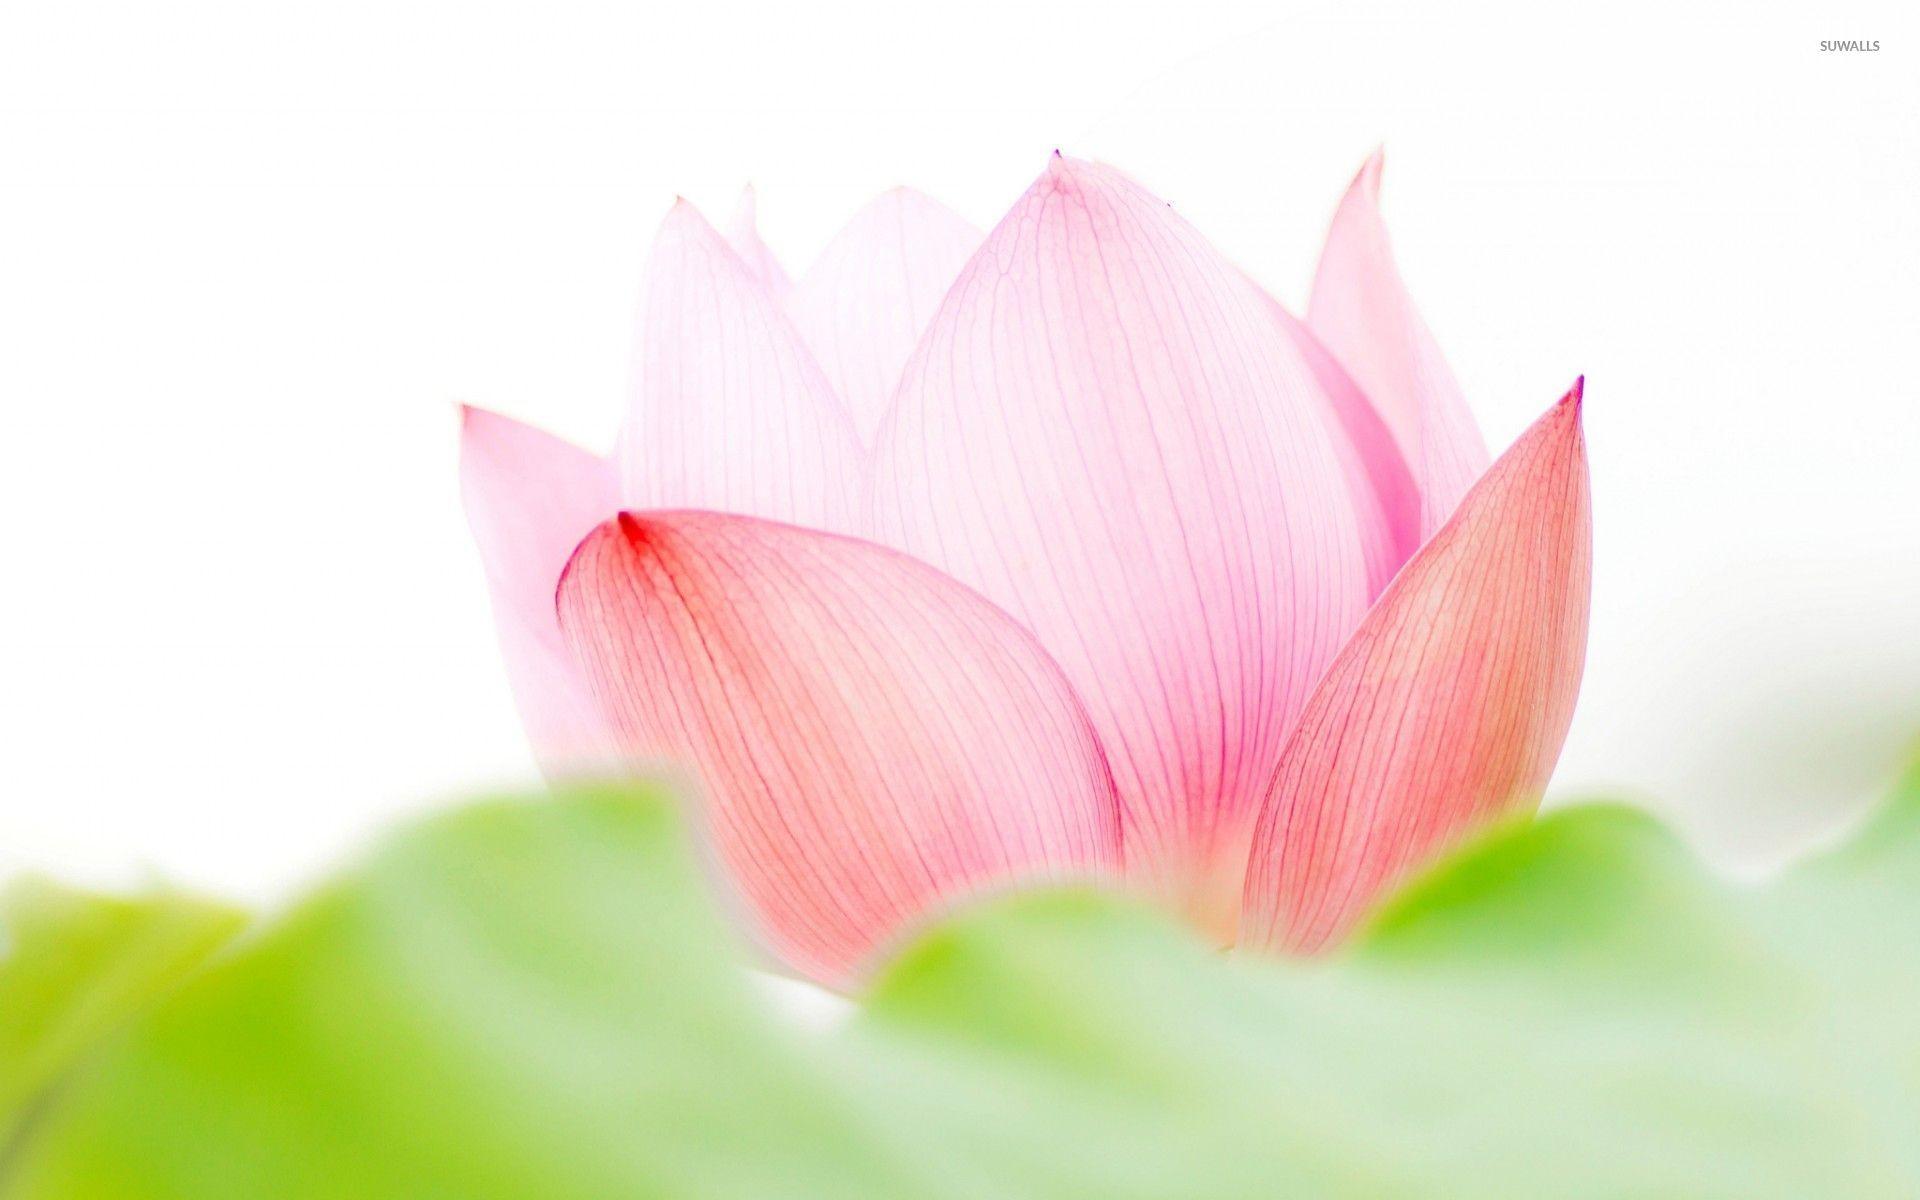 Lotus flower background 54 images 2178x1242 lotus flower clipart no background clipart clipart clipart izmirmasajfo